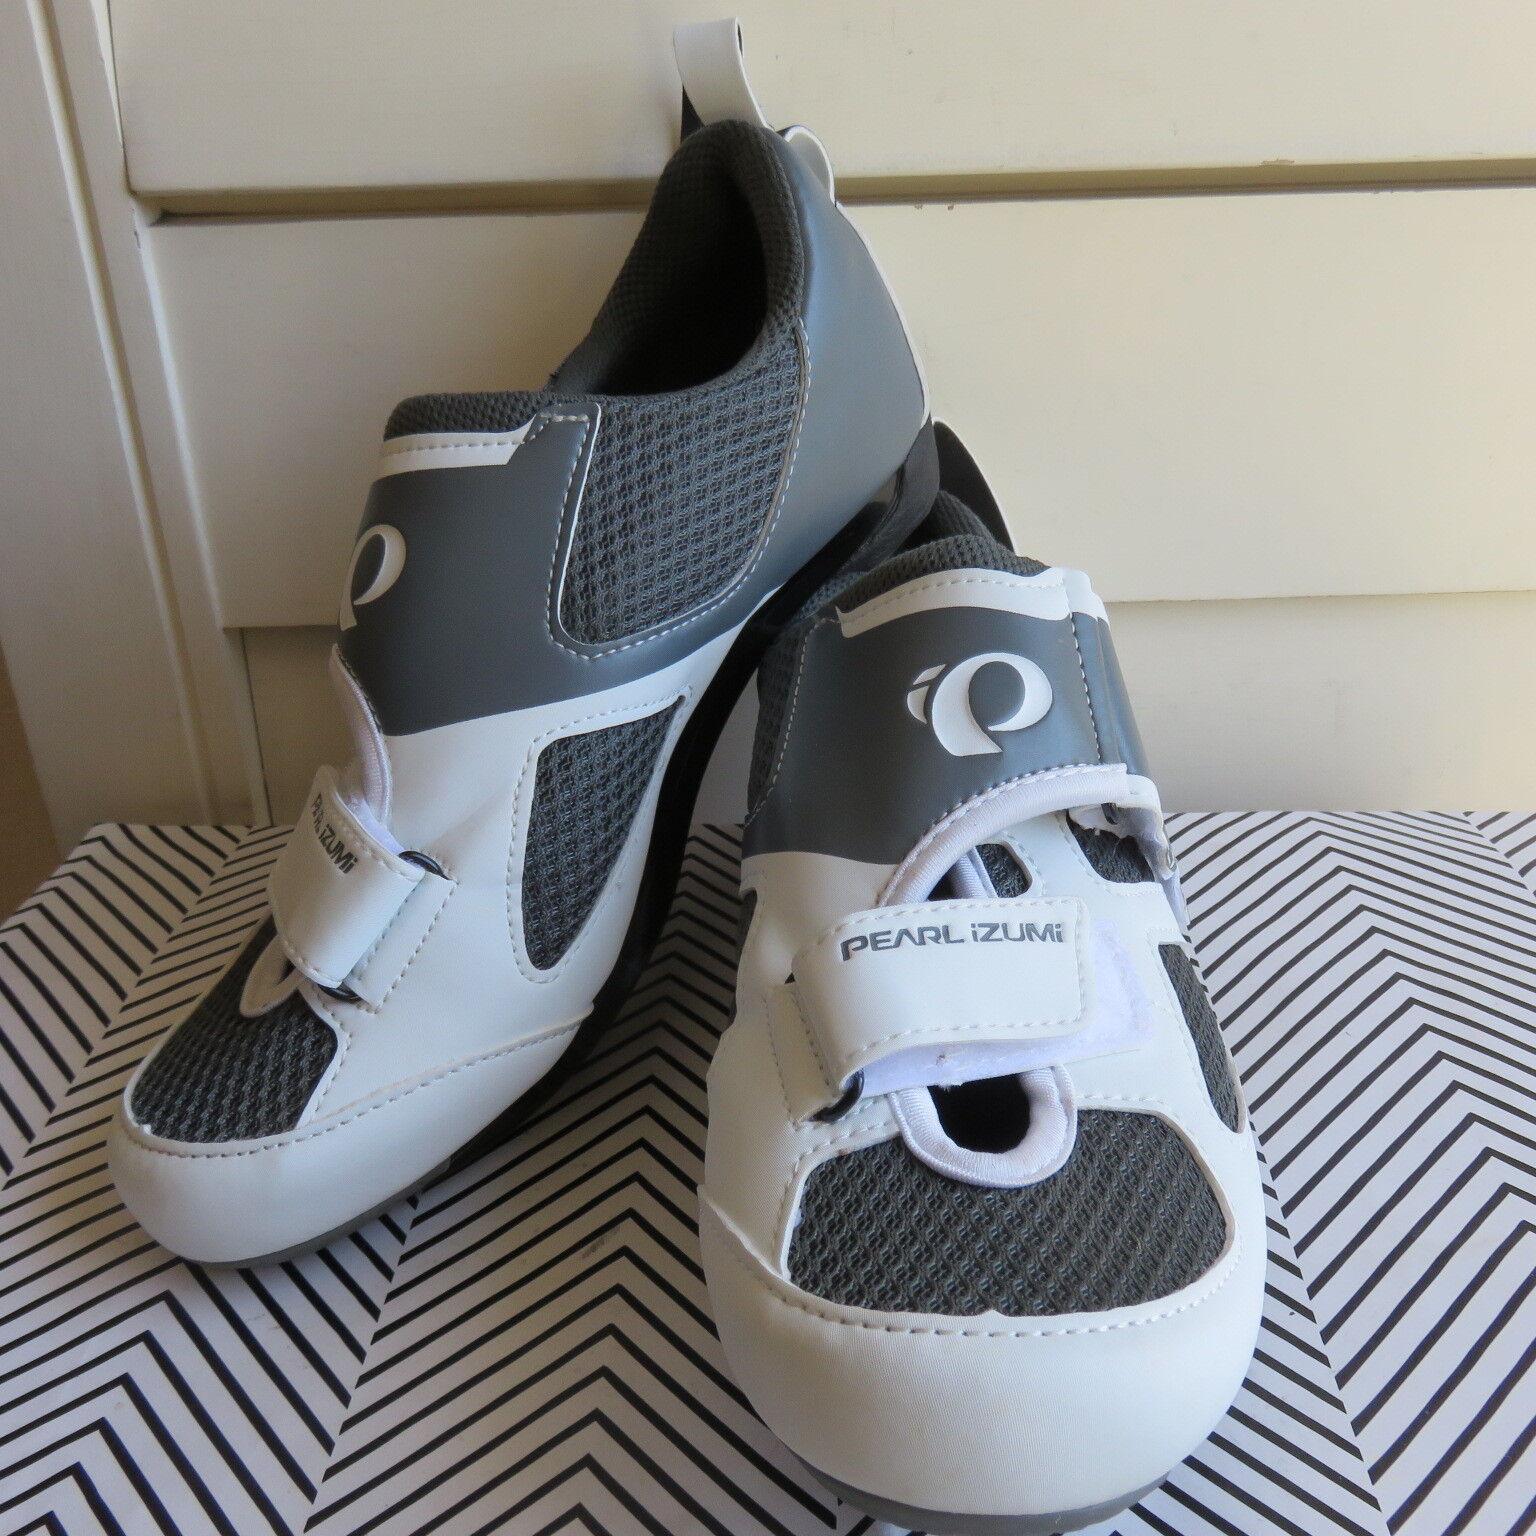 PEARL IZUMI 38.5 7.2 M Inteface W Tri Fly V para Mujer Zapatos De Ciclismo Shimano SH51